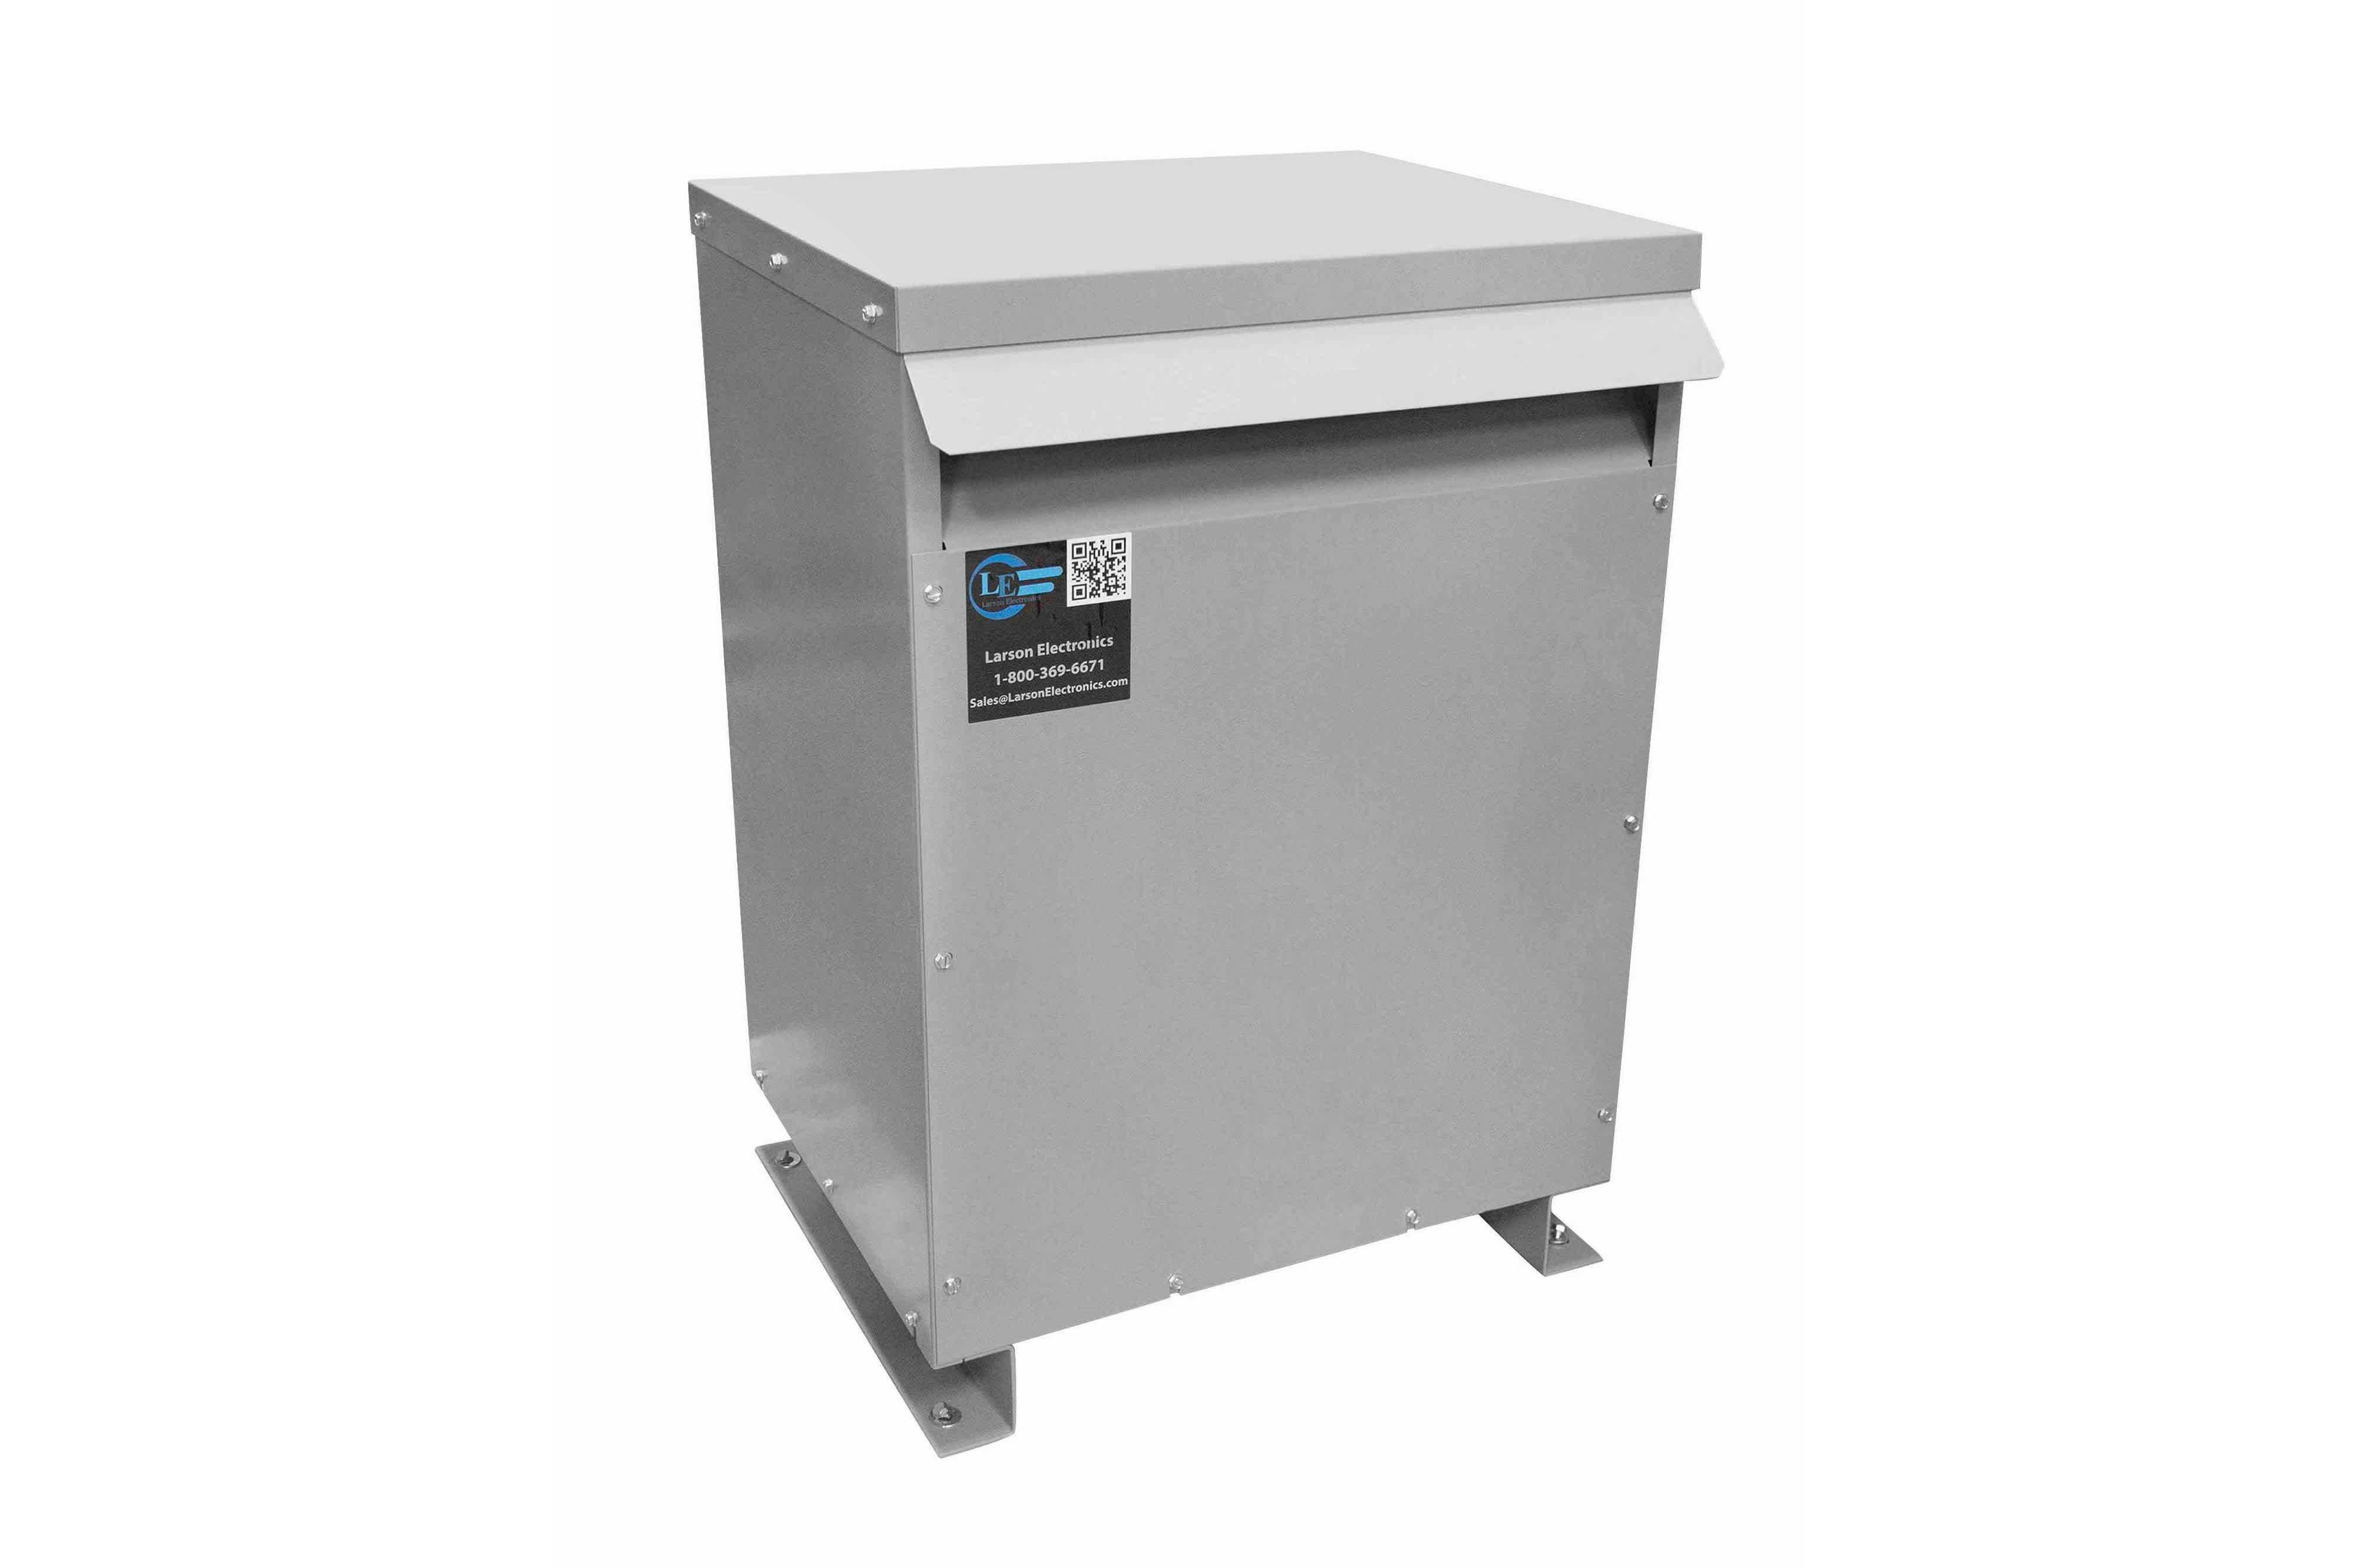 60 kVA 3PH Isolation Transformer, 460V Wye Primary, 400V Delta Secondary, N3R, Ventilated, 60 Hz